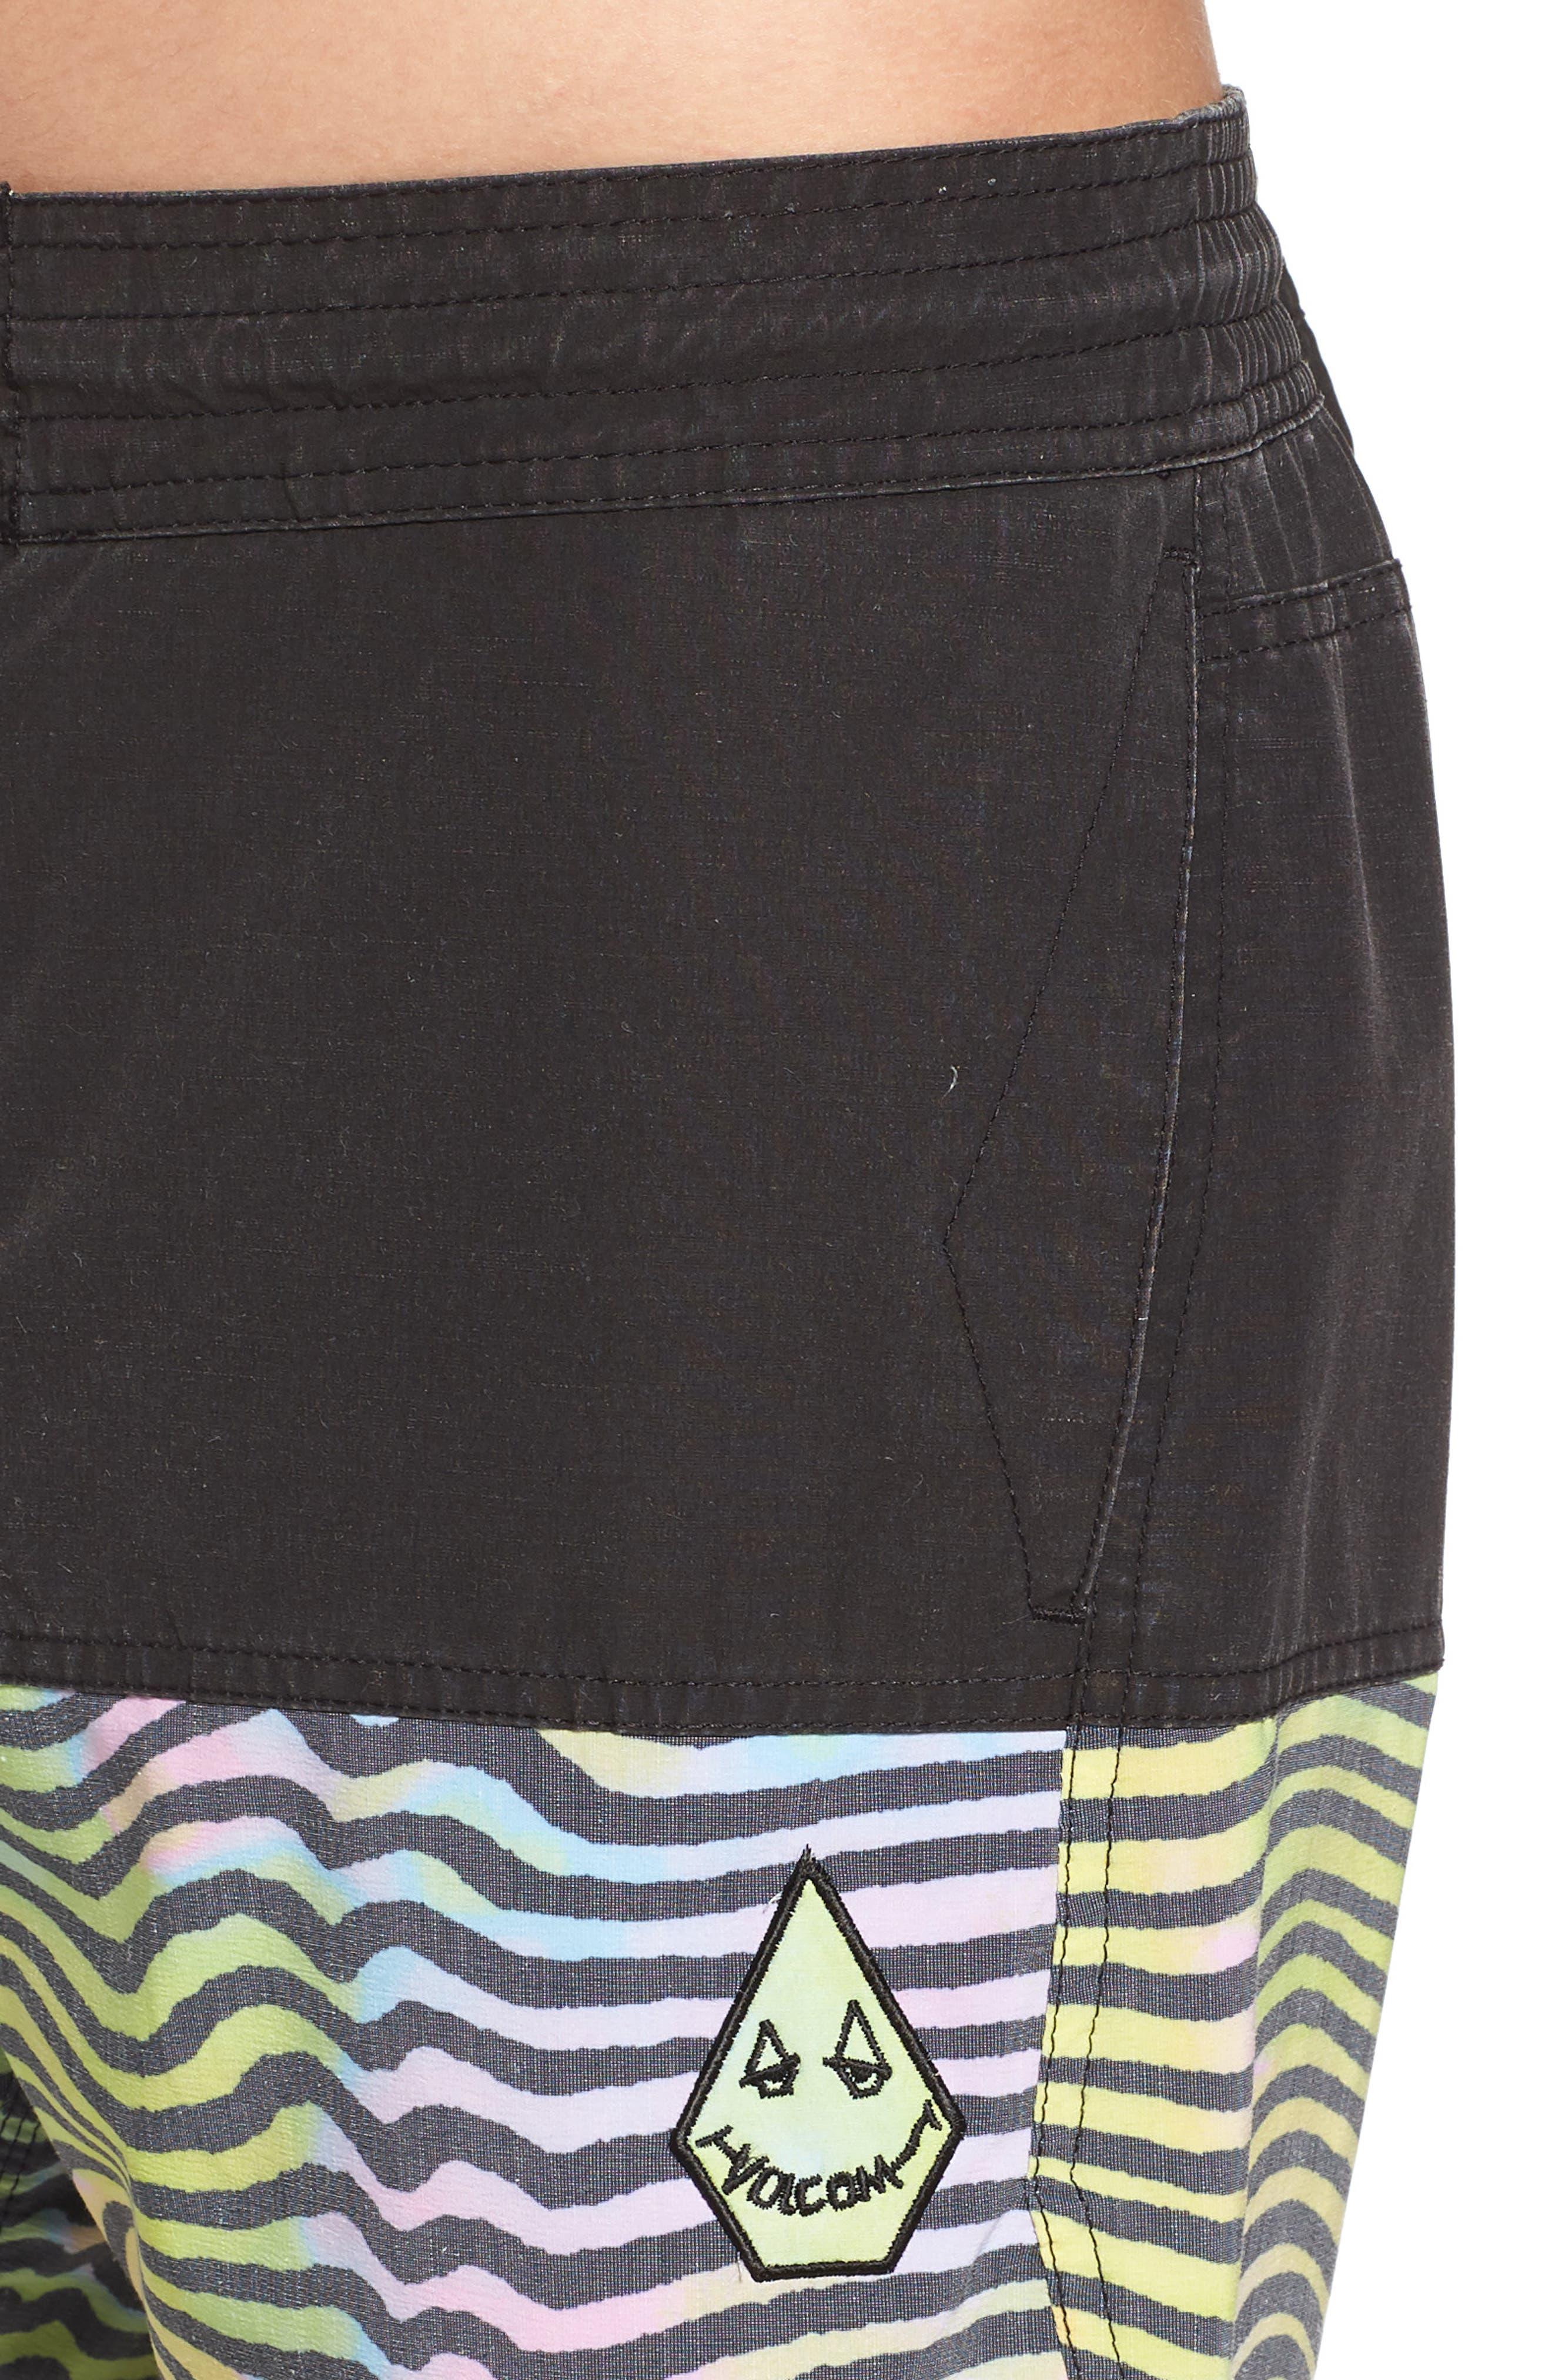 Vibes Half Stoney Board Shorts,                             Alternate thumbnail 4, color,                             Multi